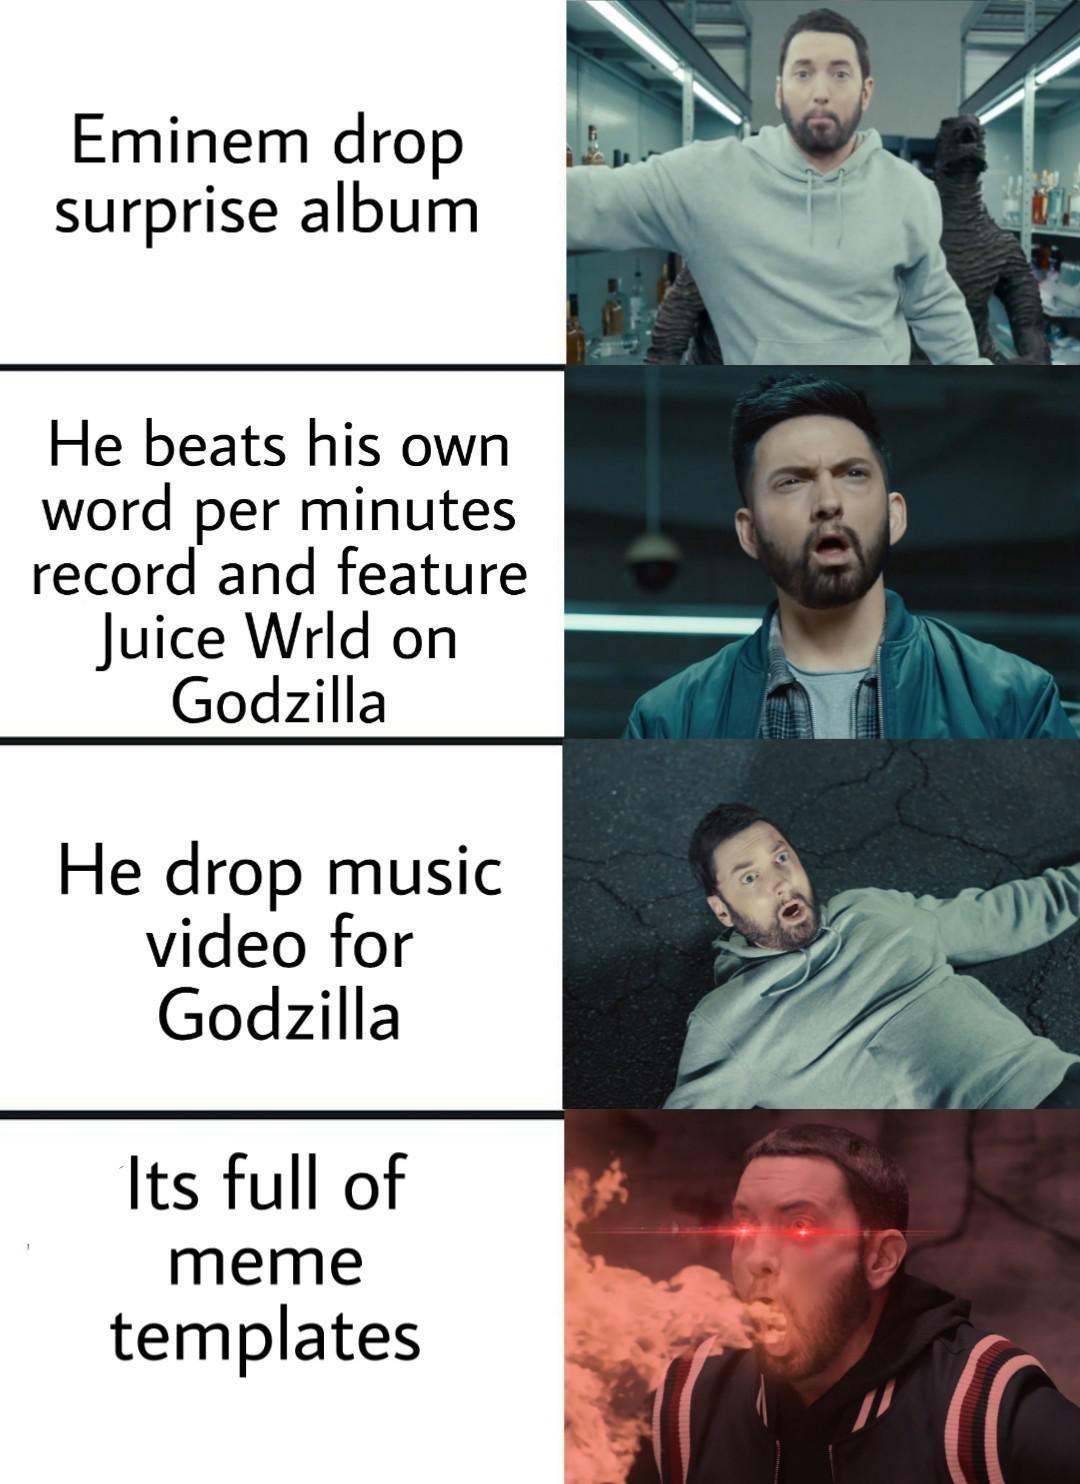 Eminem Godzilla Meme Templates In 2020 Memes New Memes Stupid